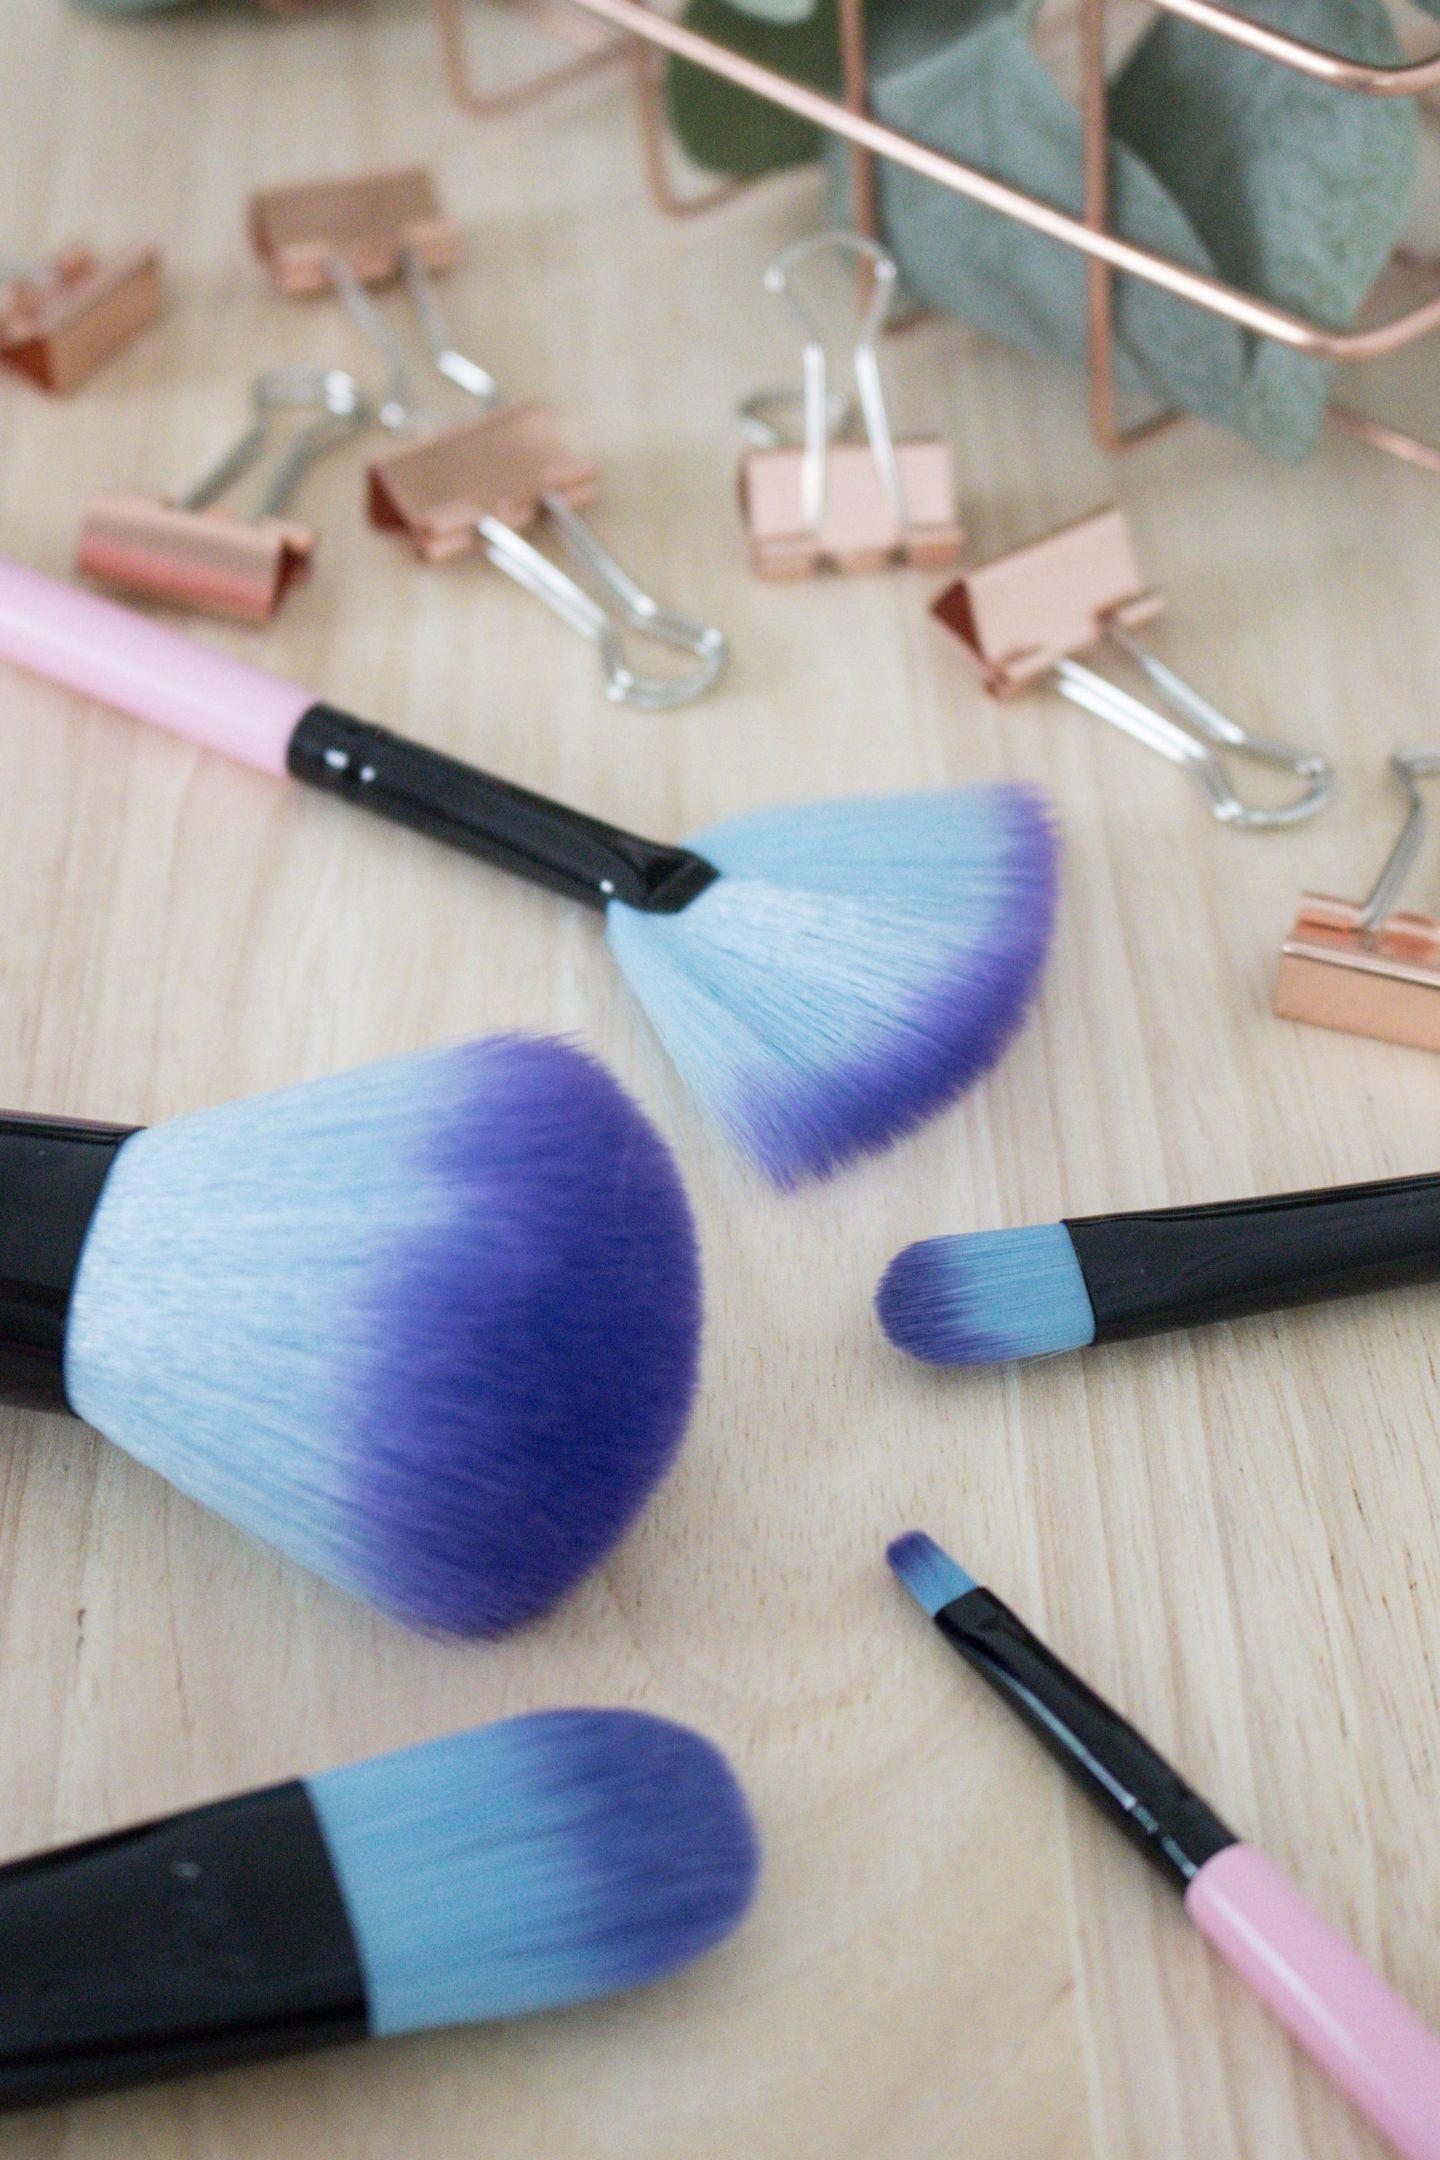 Spectrum Millennial Pink Brushes